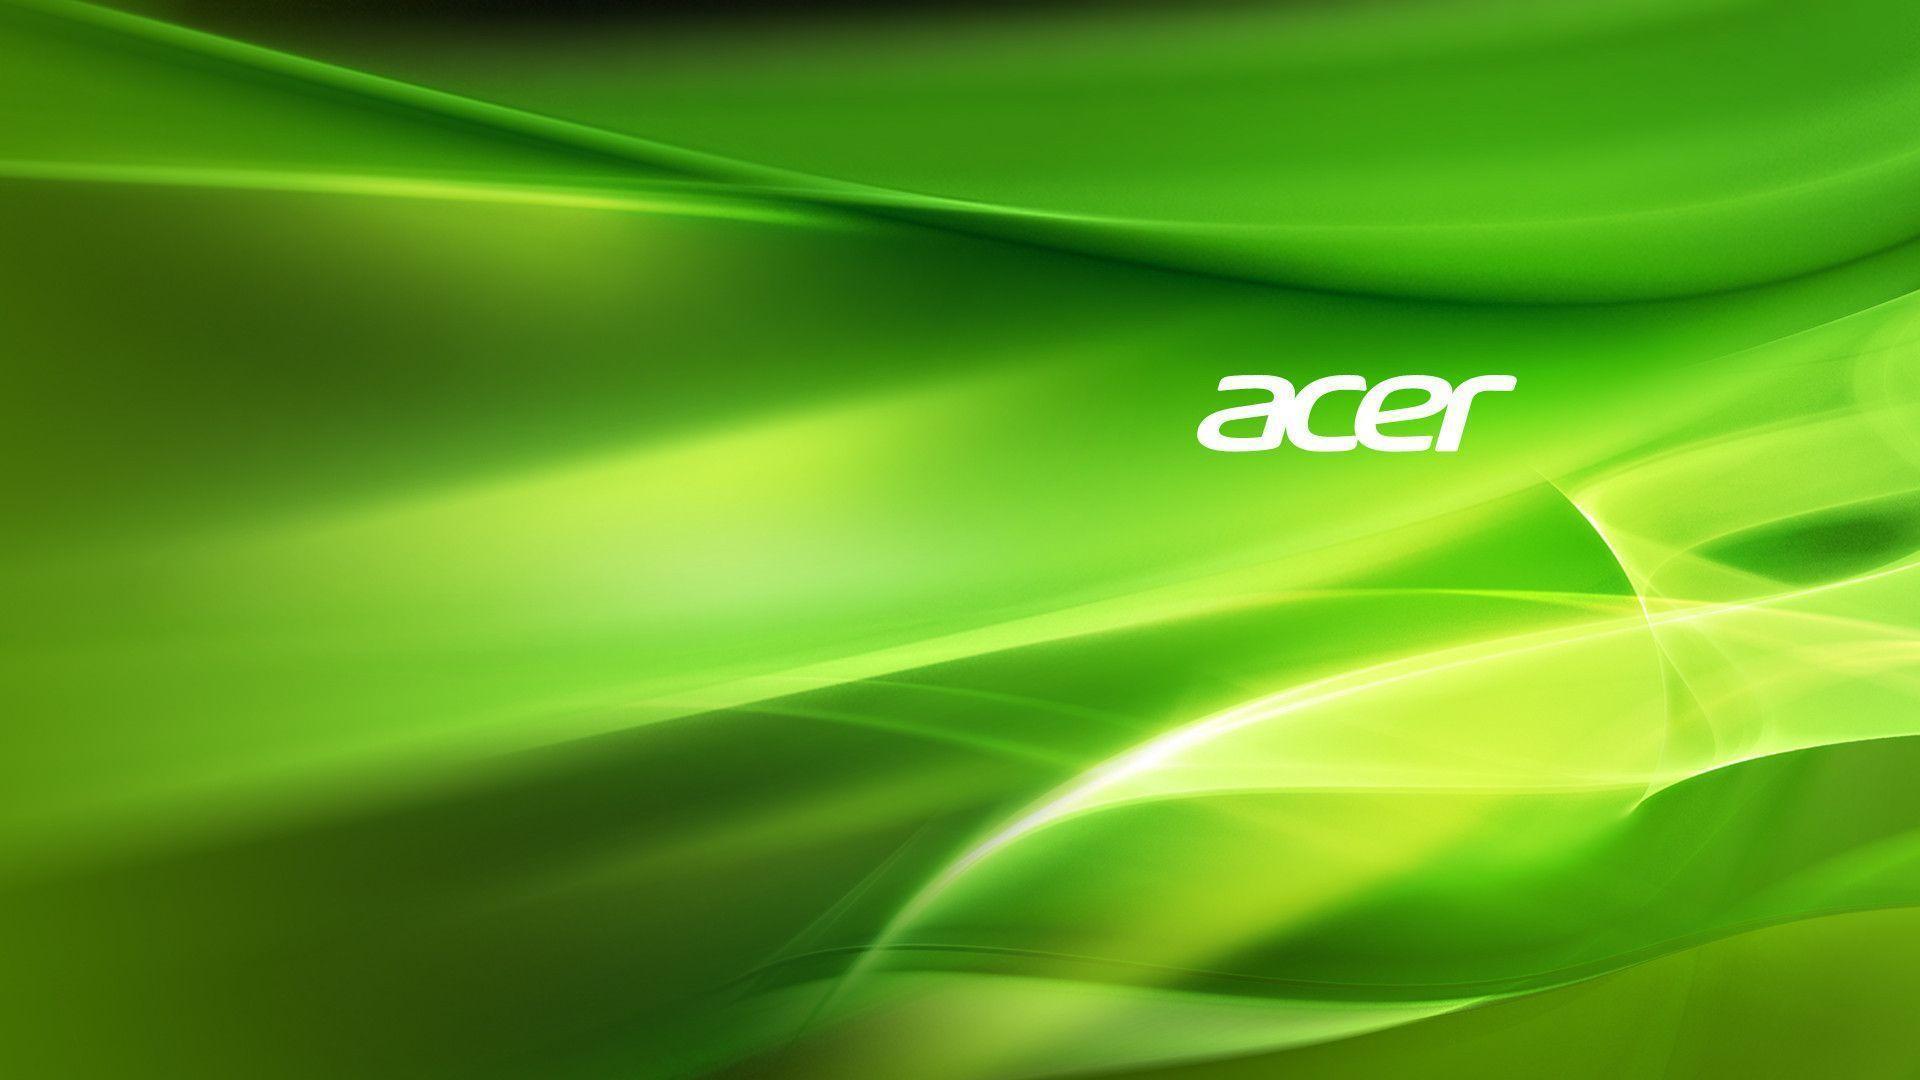 Acer Veriton Wallpaper 2015